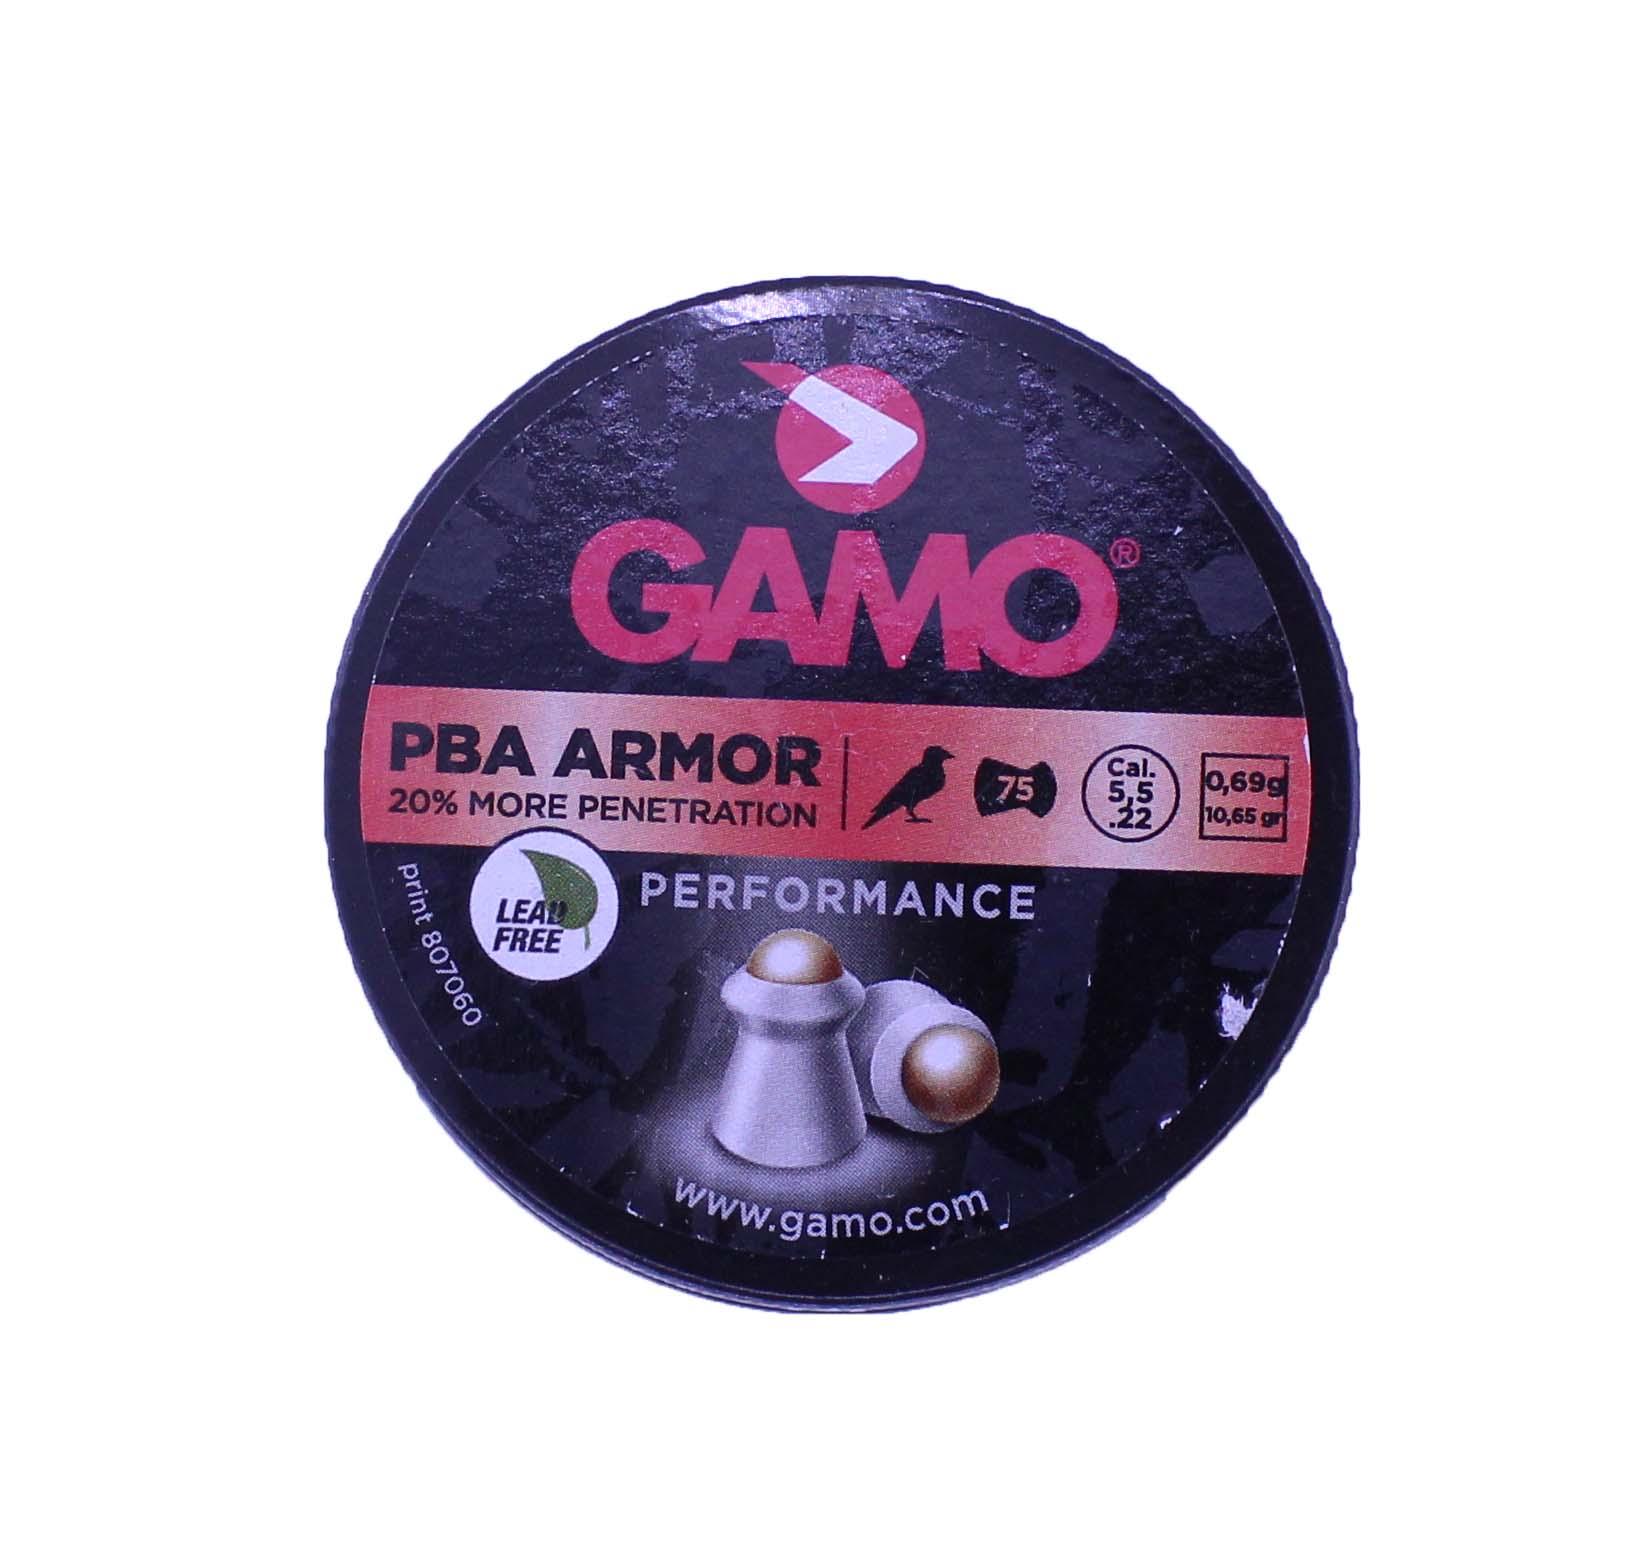 Chumbinho Gamo PBA Armor .22/ 5.5mm